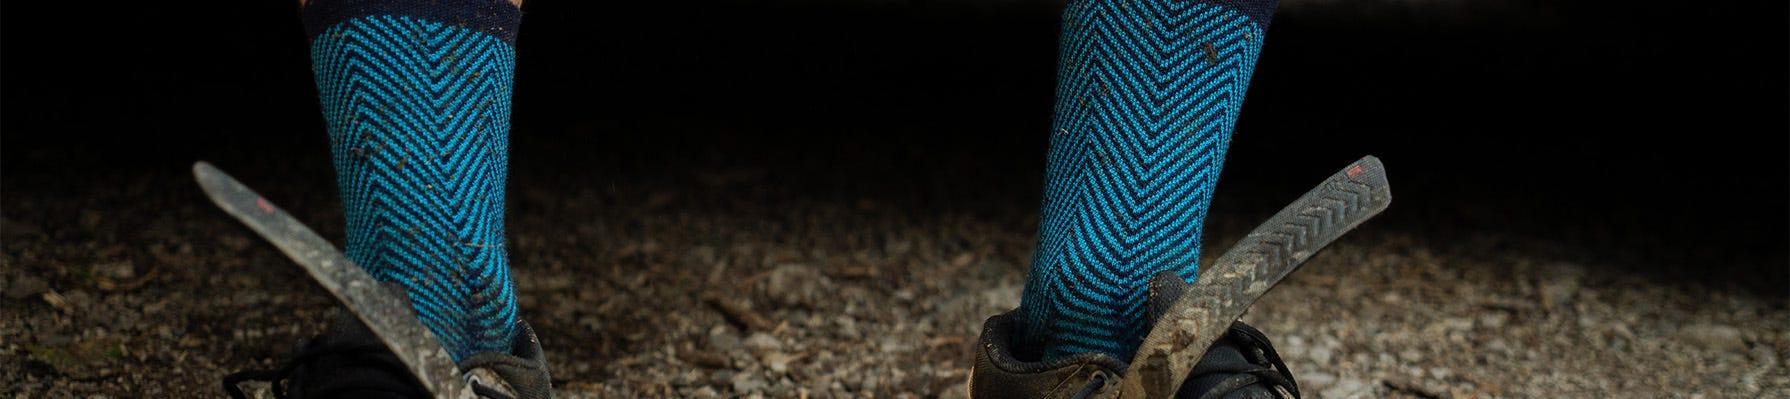 Footwear - Shimano